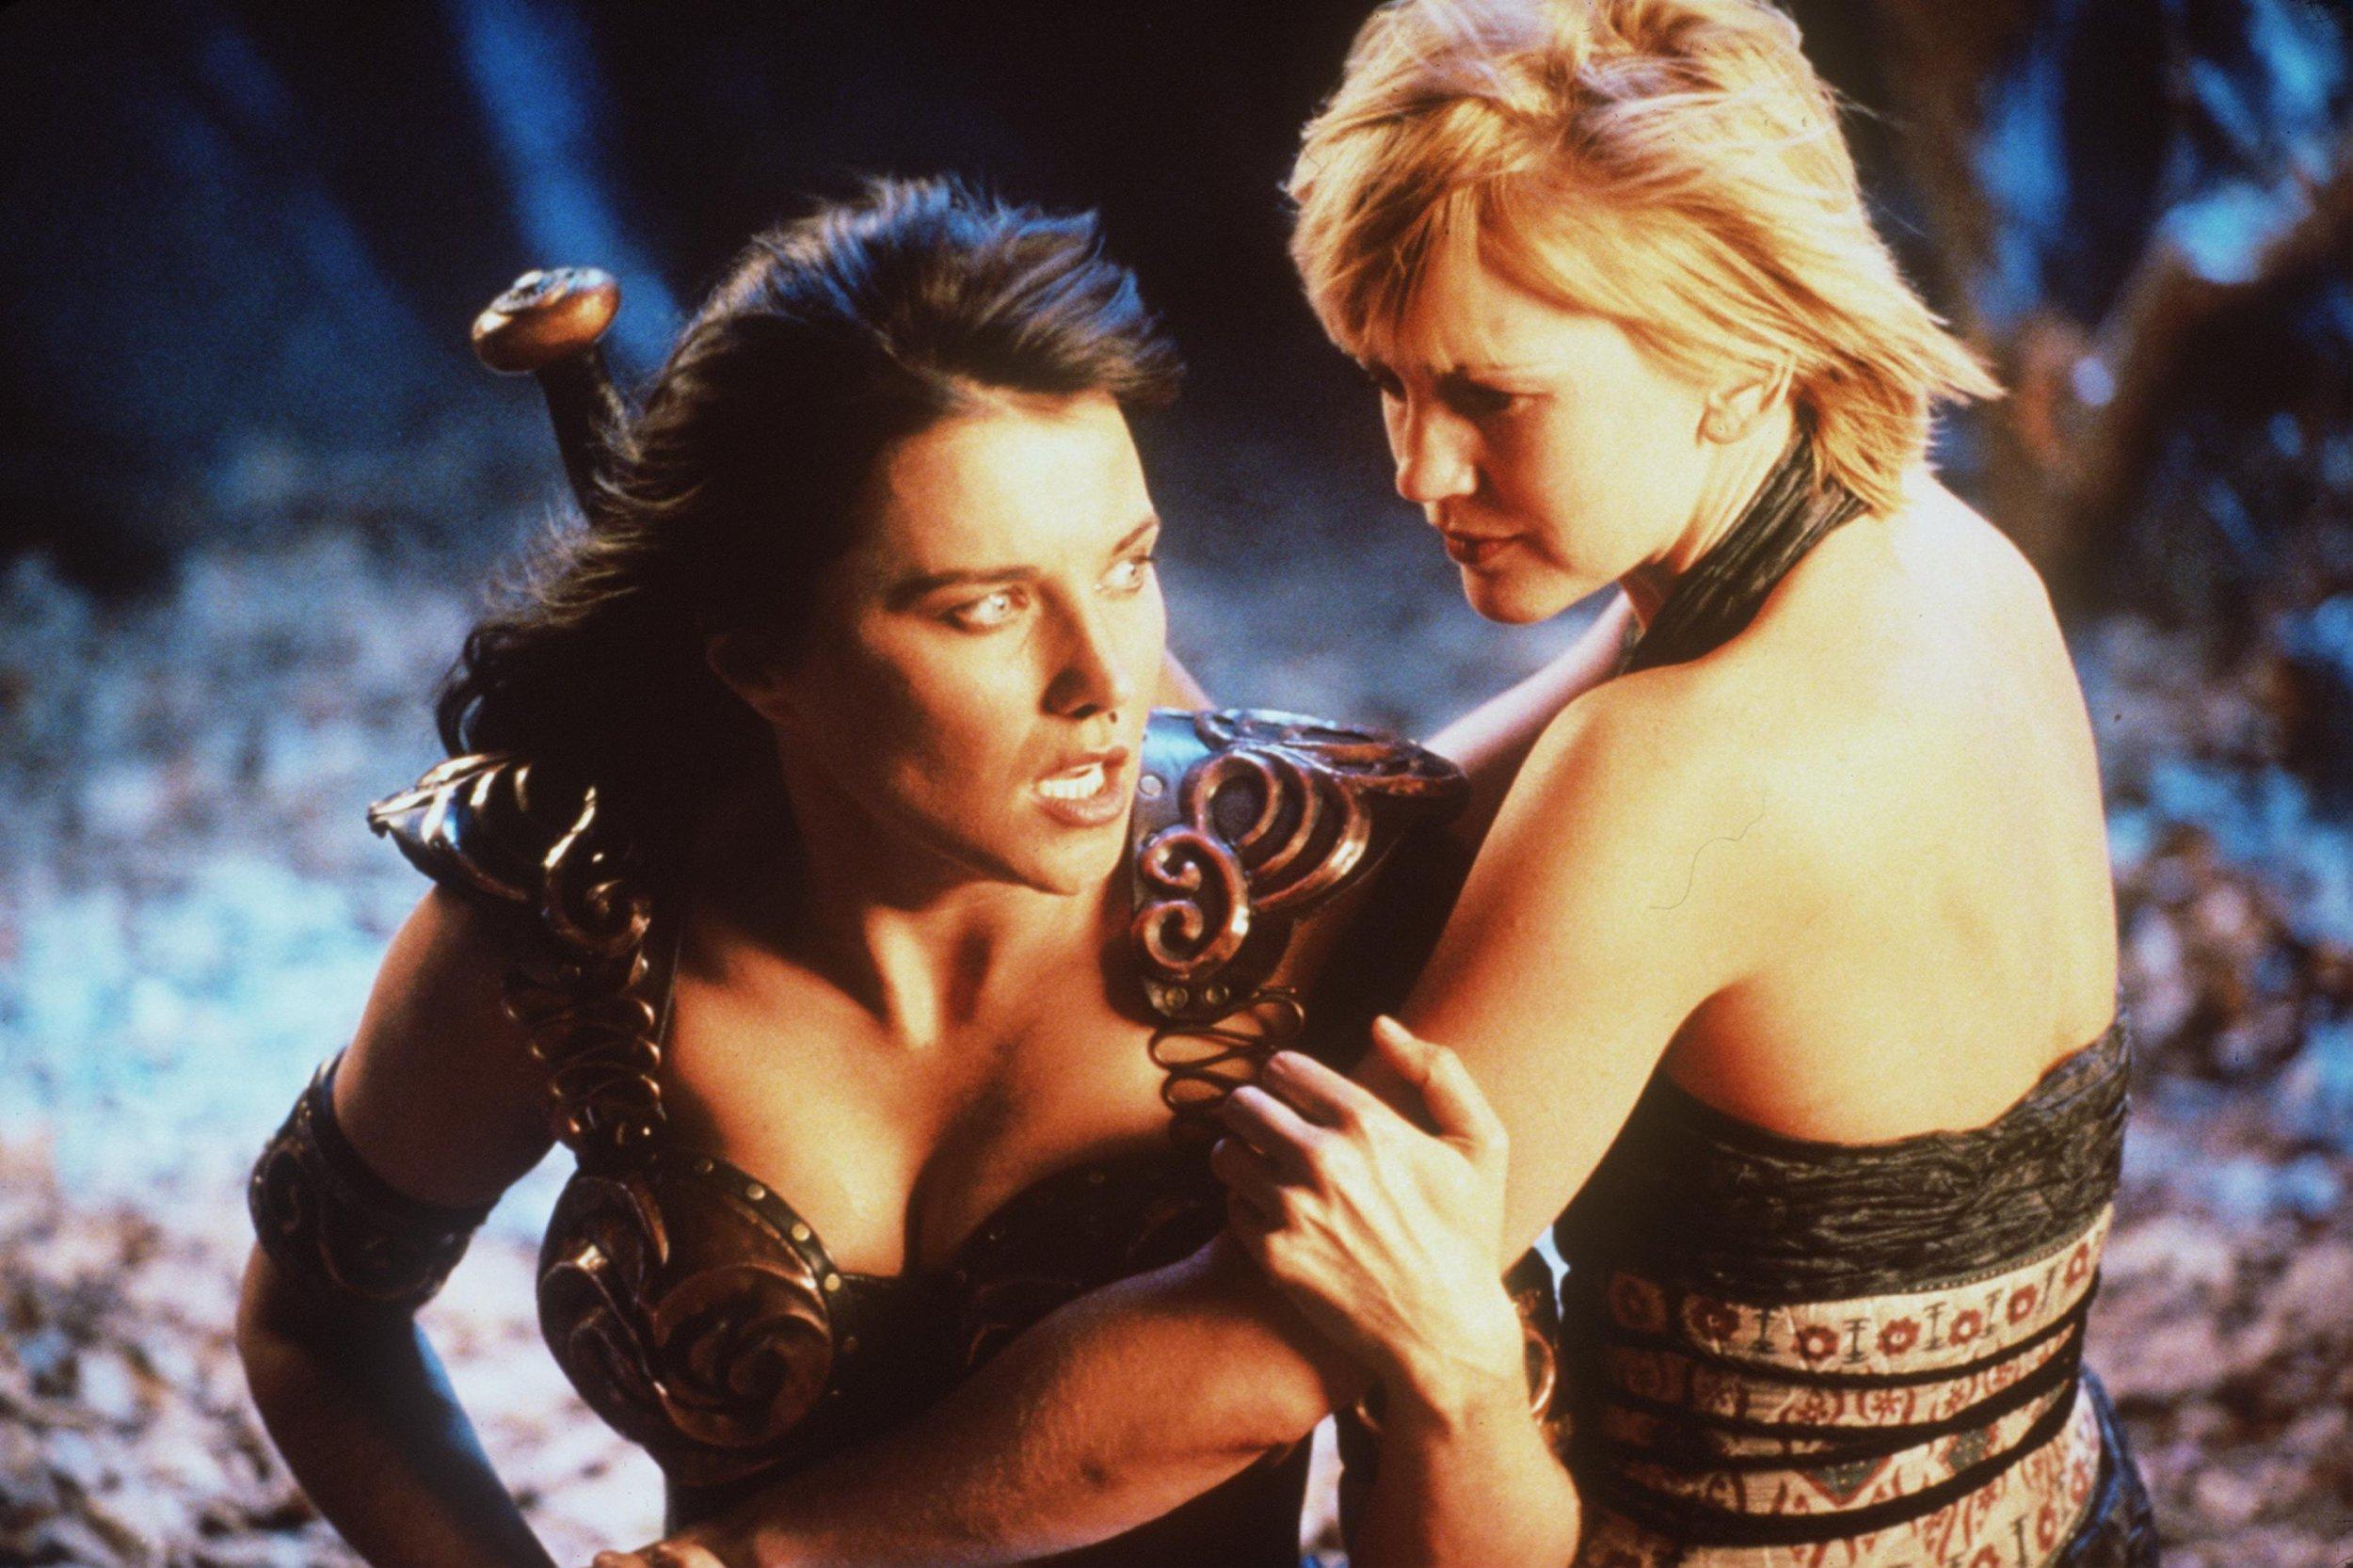 Xena: Warrior Princess - Xena and Gabrielle